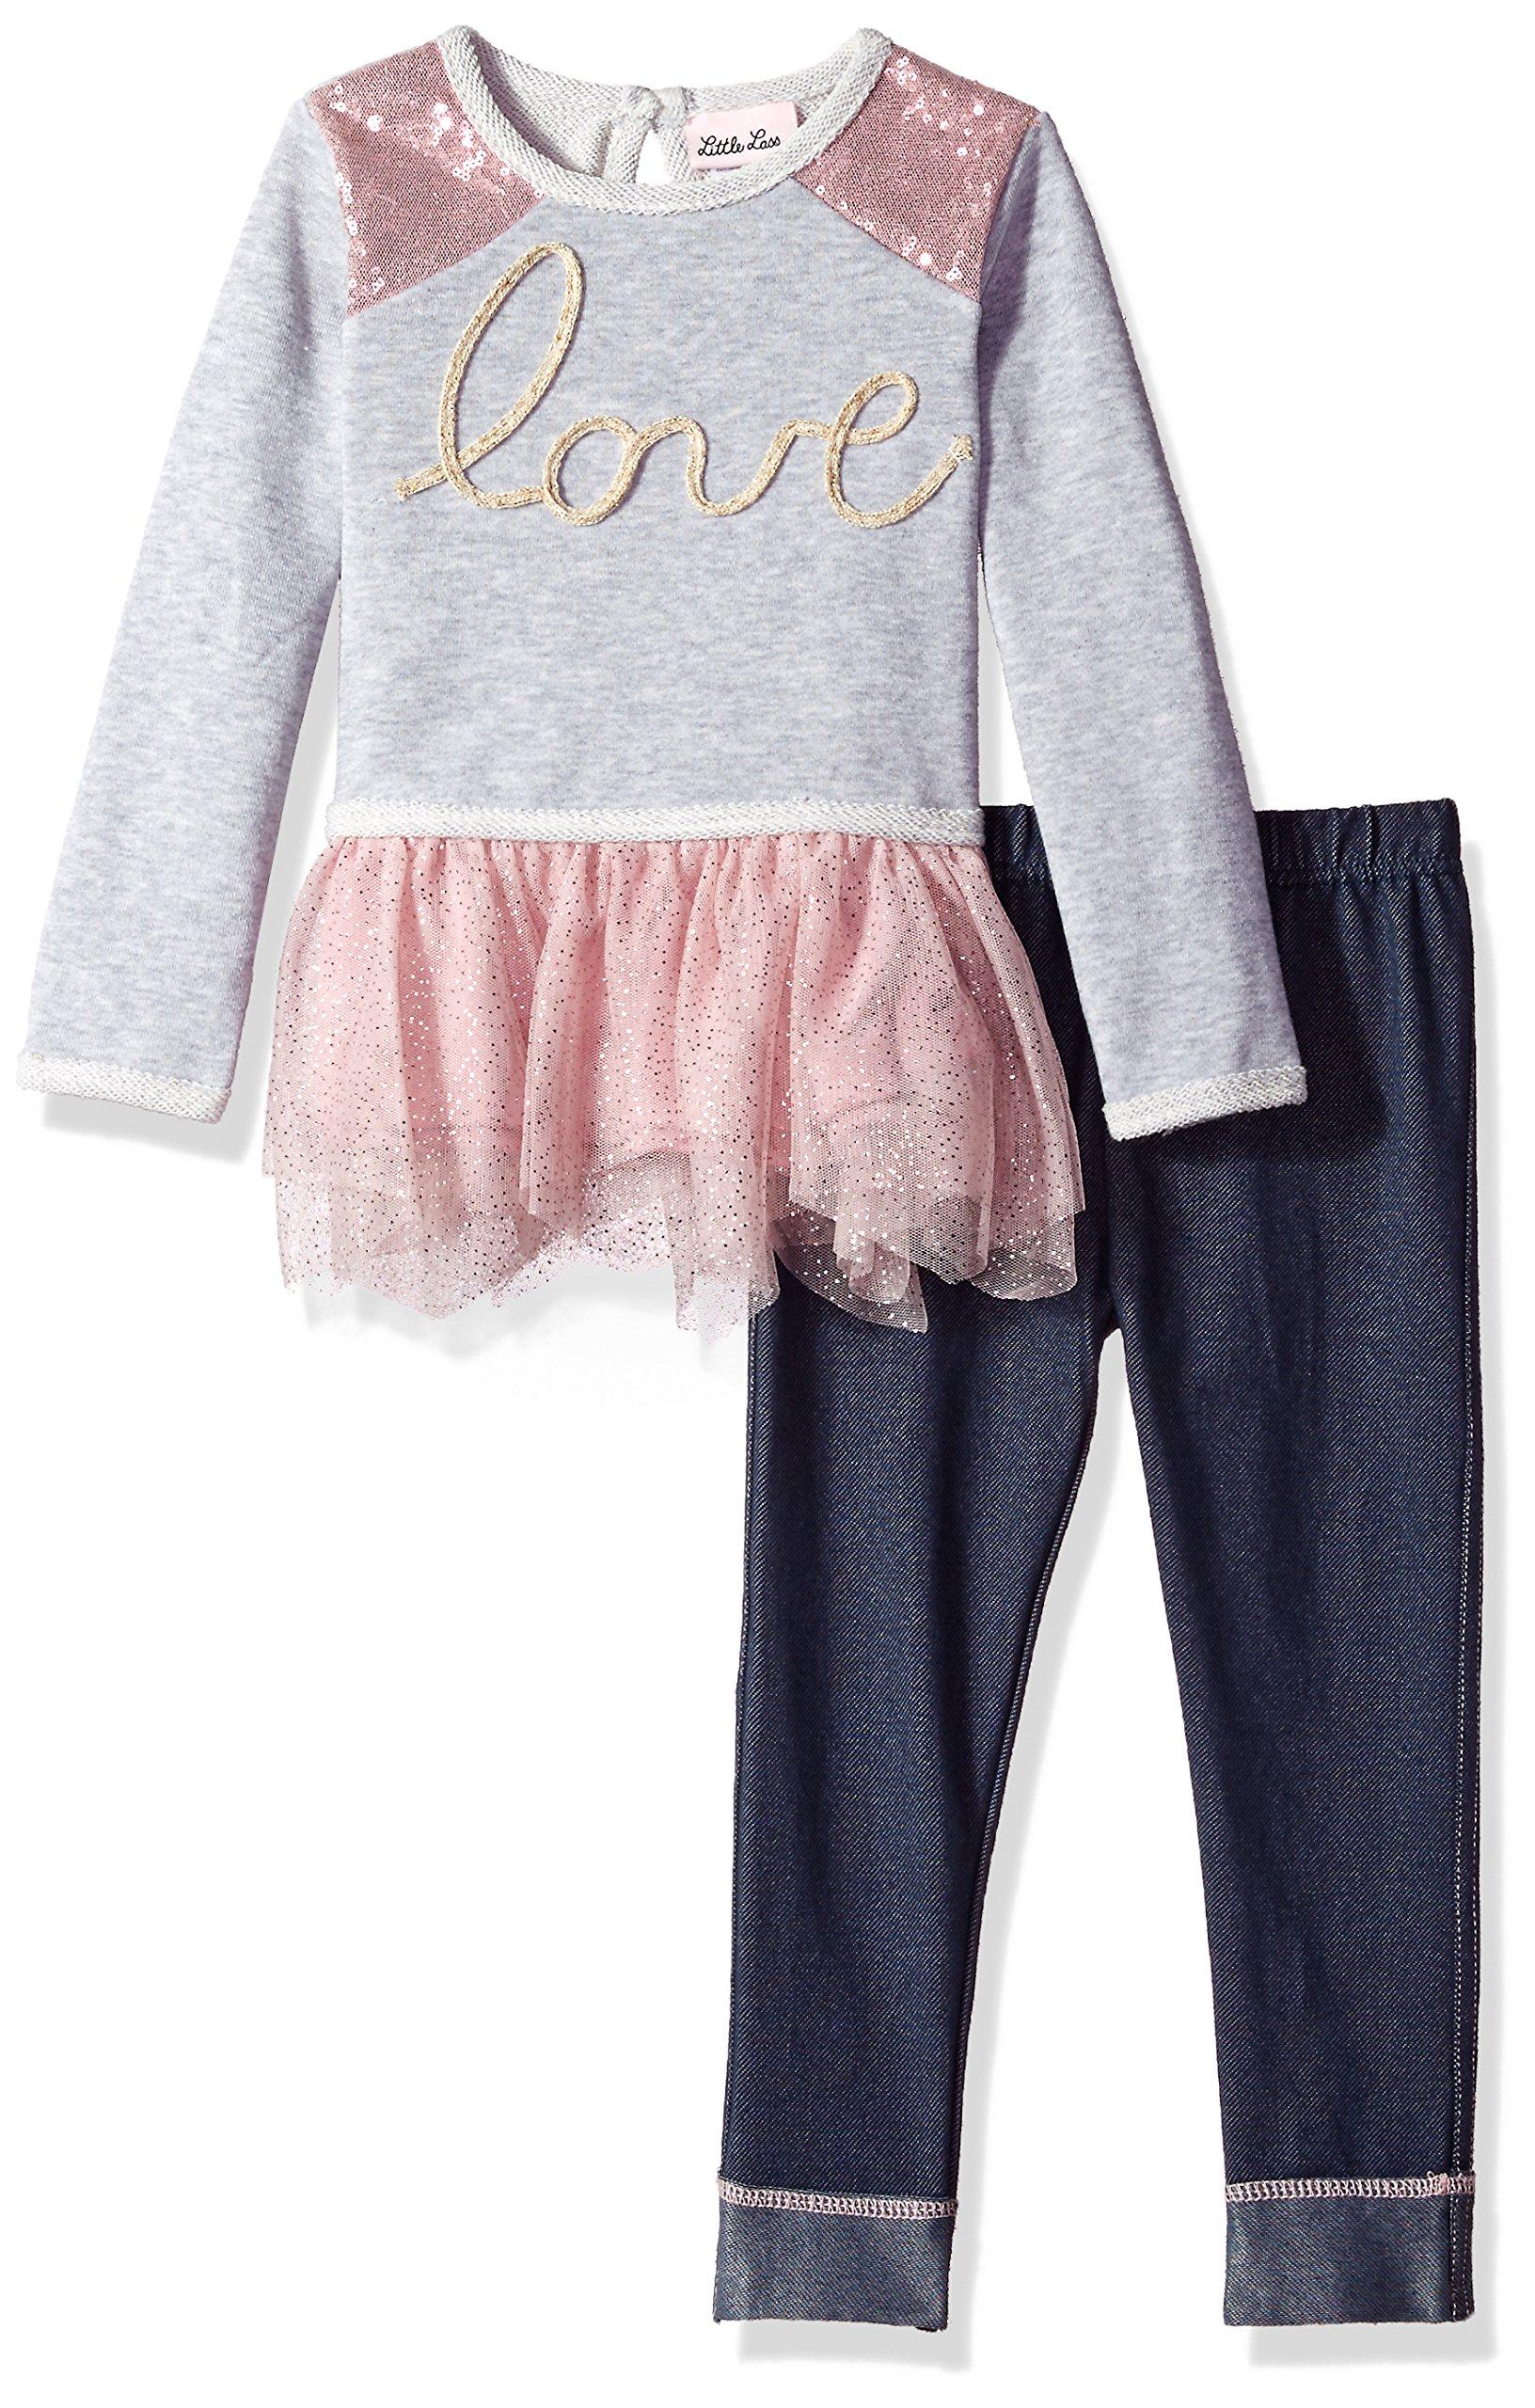 Little Lass Toddler Girls' 2 Pc Love Legging Set, Grey Heather, 4T